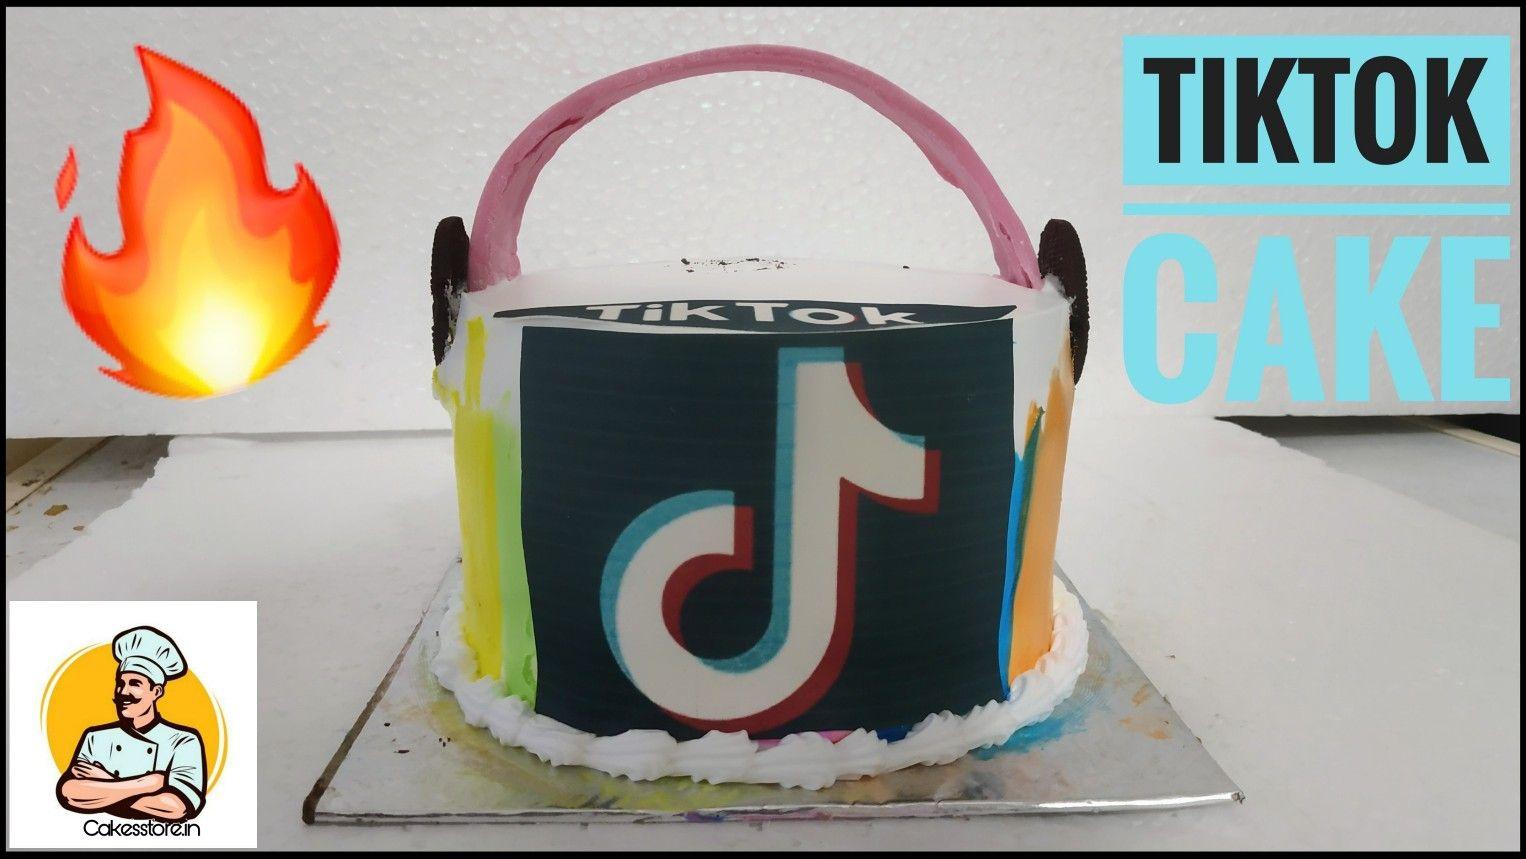 Tiktok Cake Photo Cake Easy Cake Decoration Photo Cake Storing Cake Cake